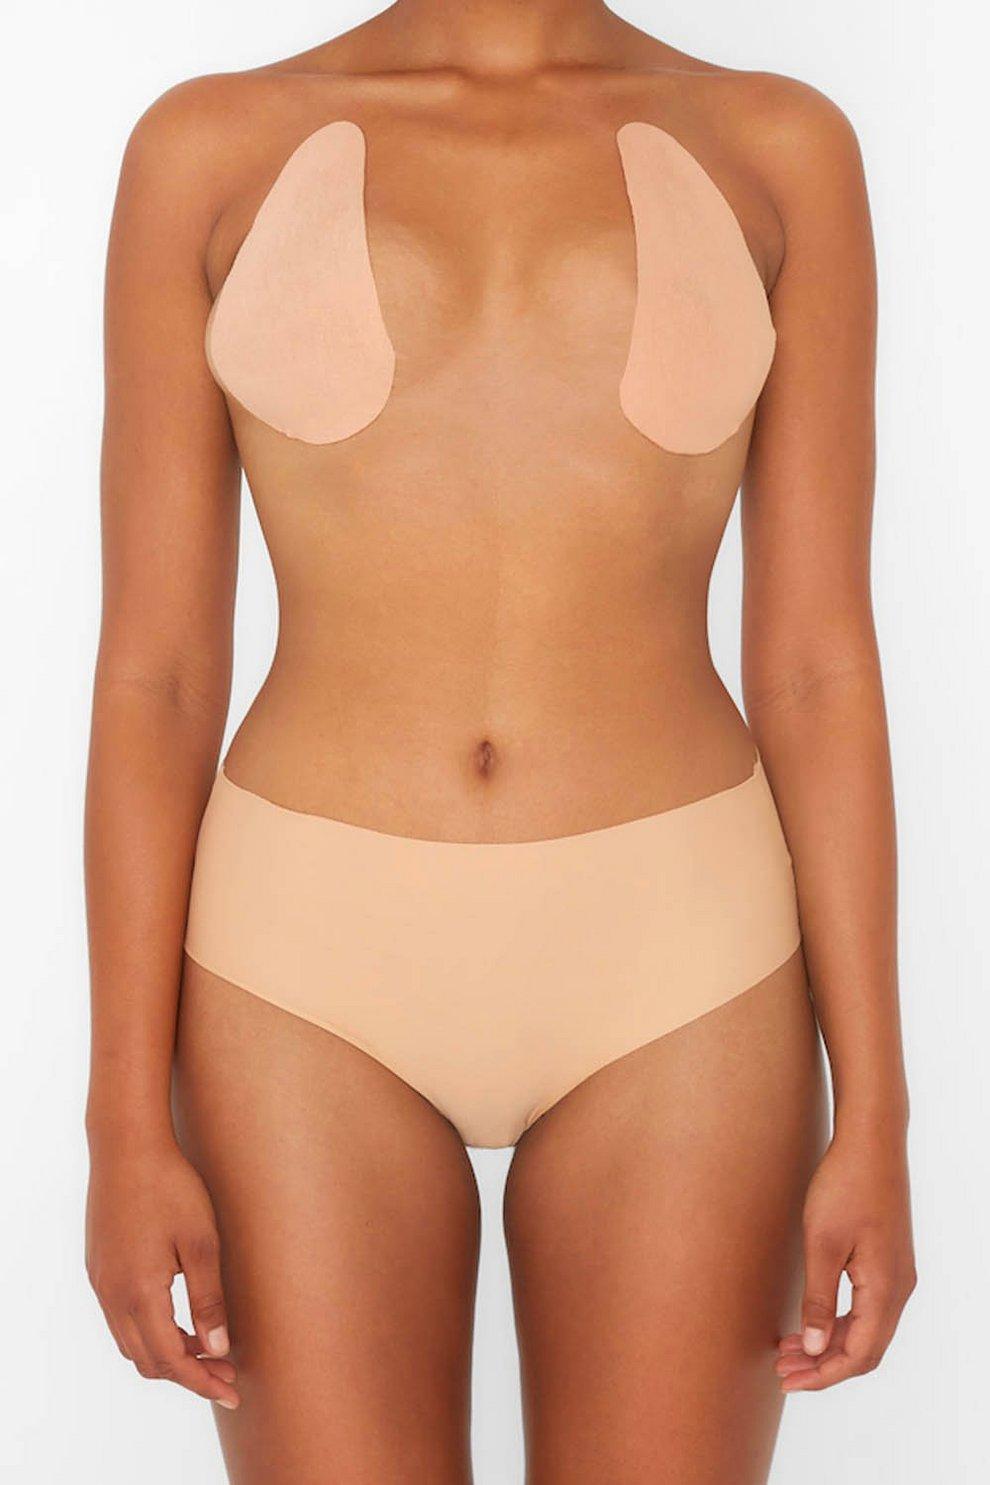 4b9450039 Womens Beige Perky Pear Breast Lift   Shape Tape